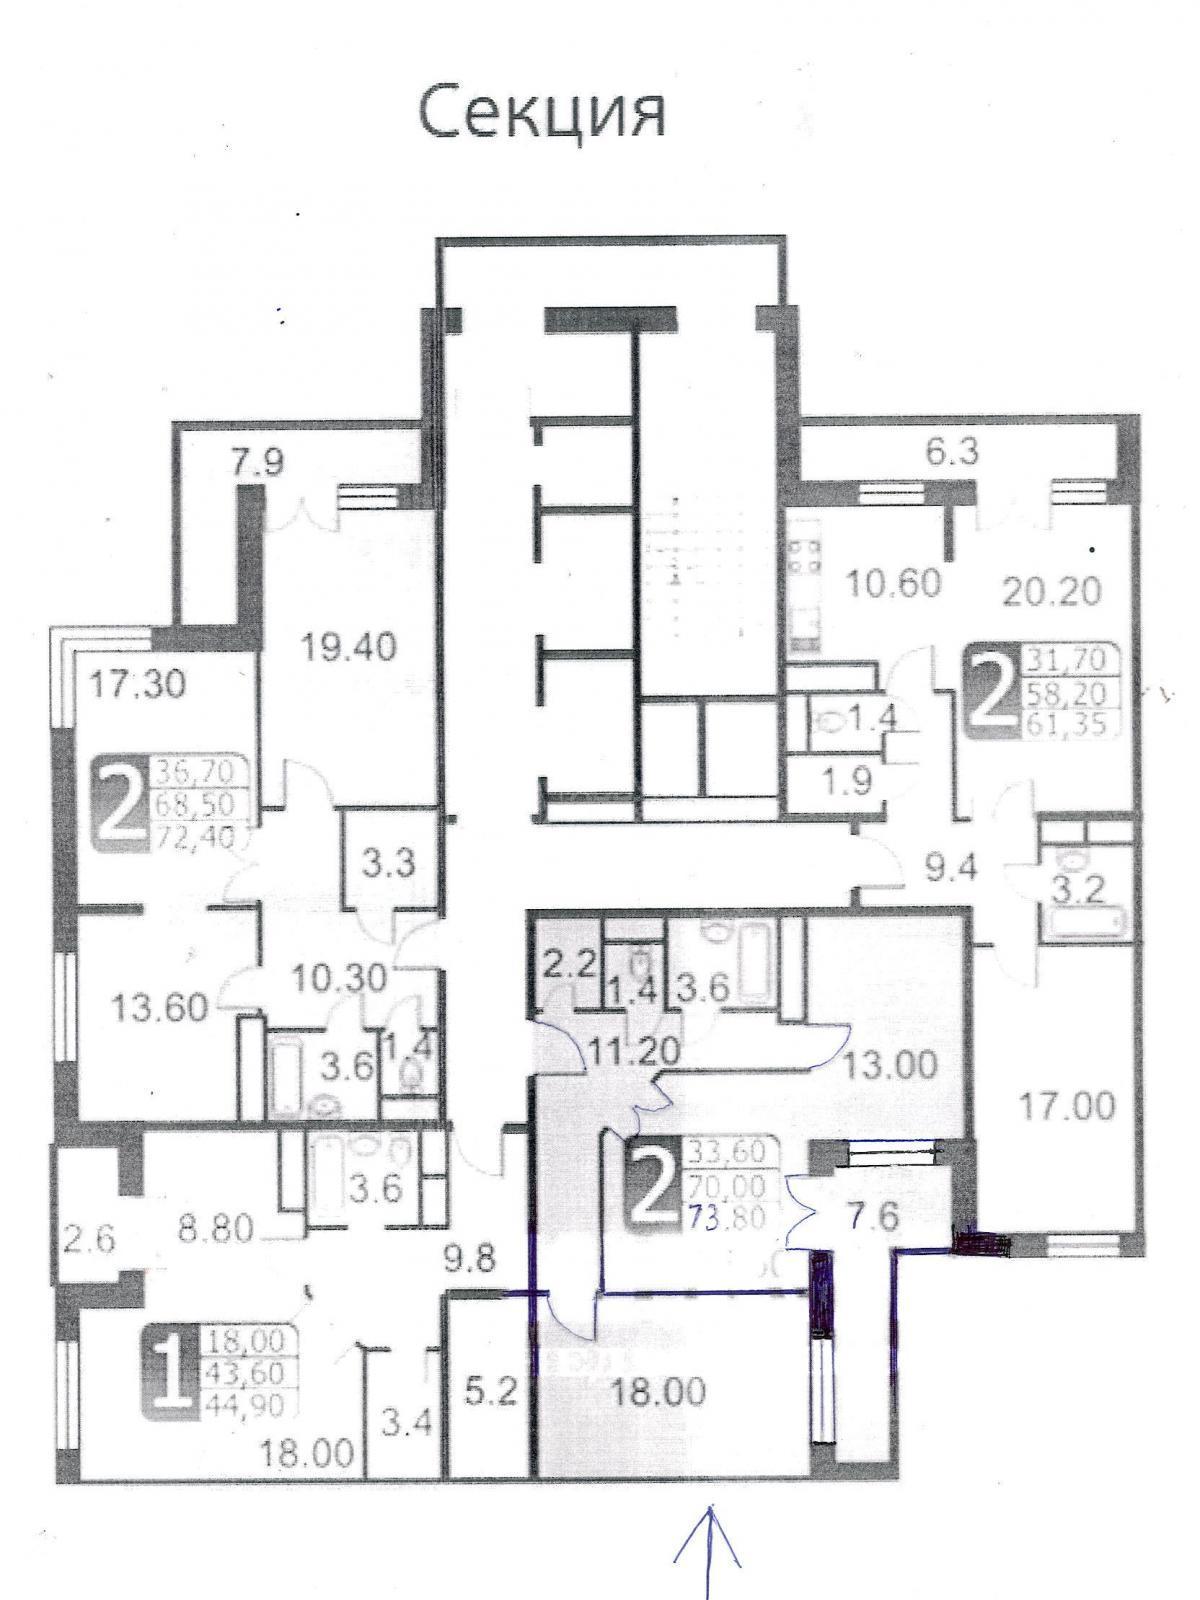 Фото №2 - 3-комнатная квартира, Москва, Ягодная улица 8 корпус 1, метро Царицыно